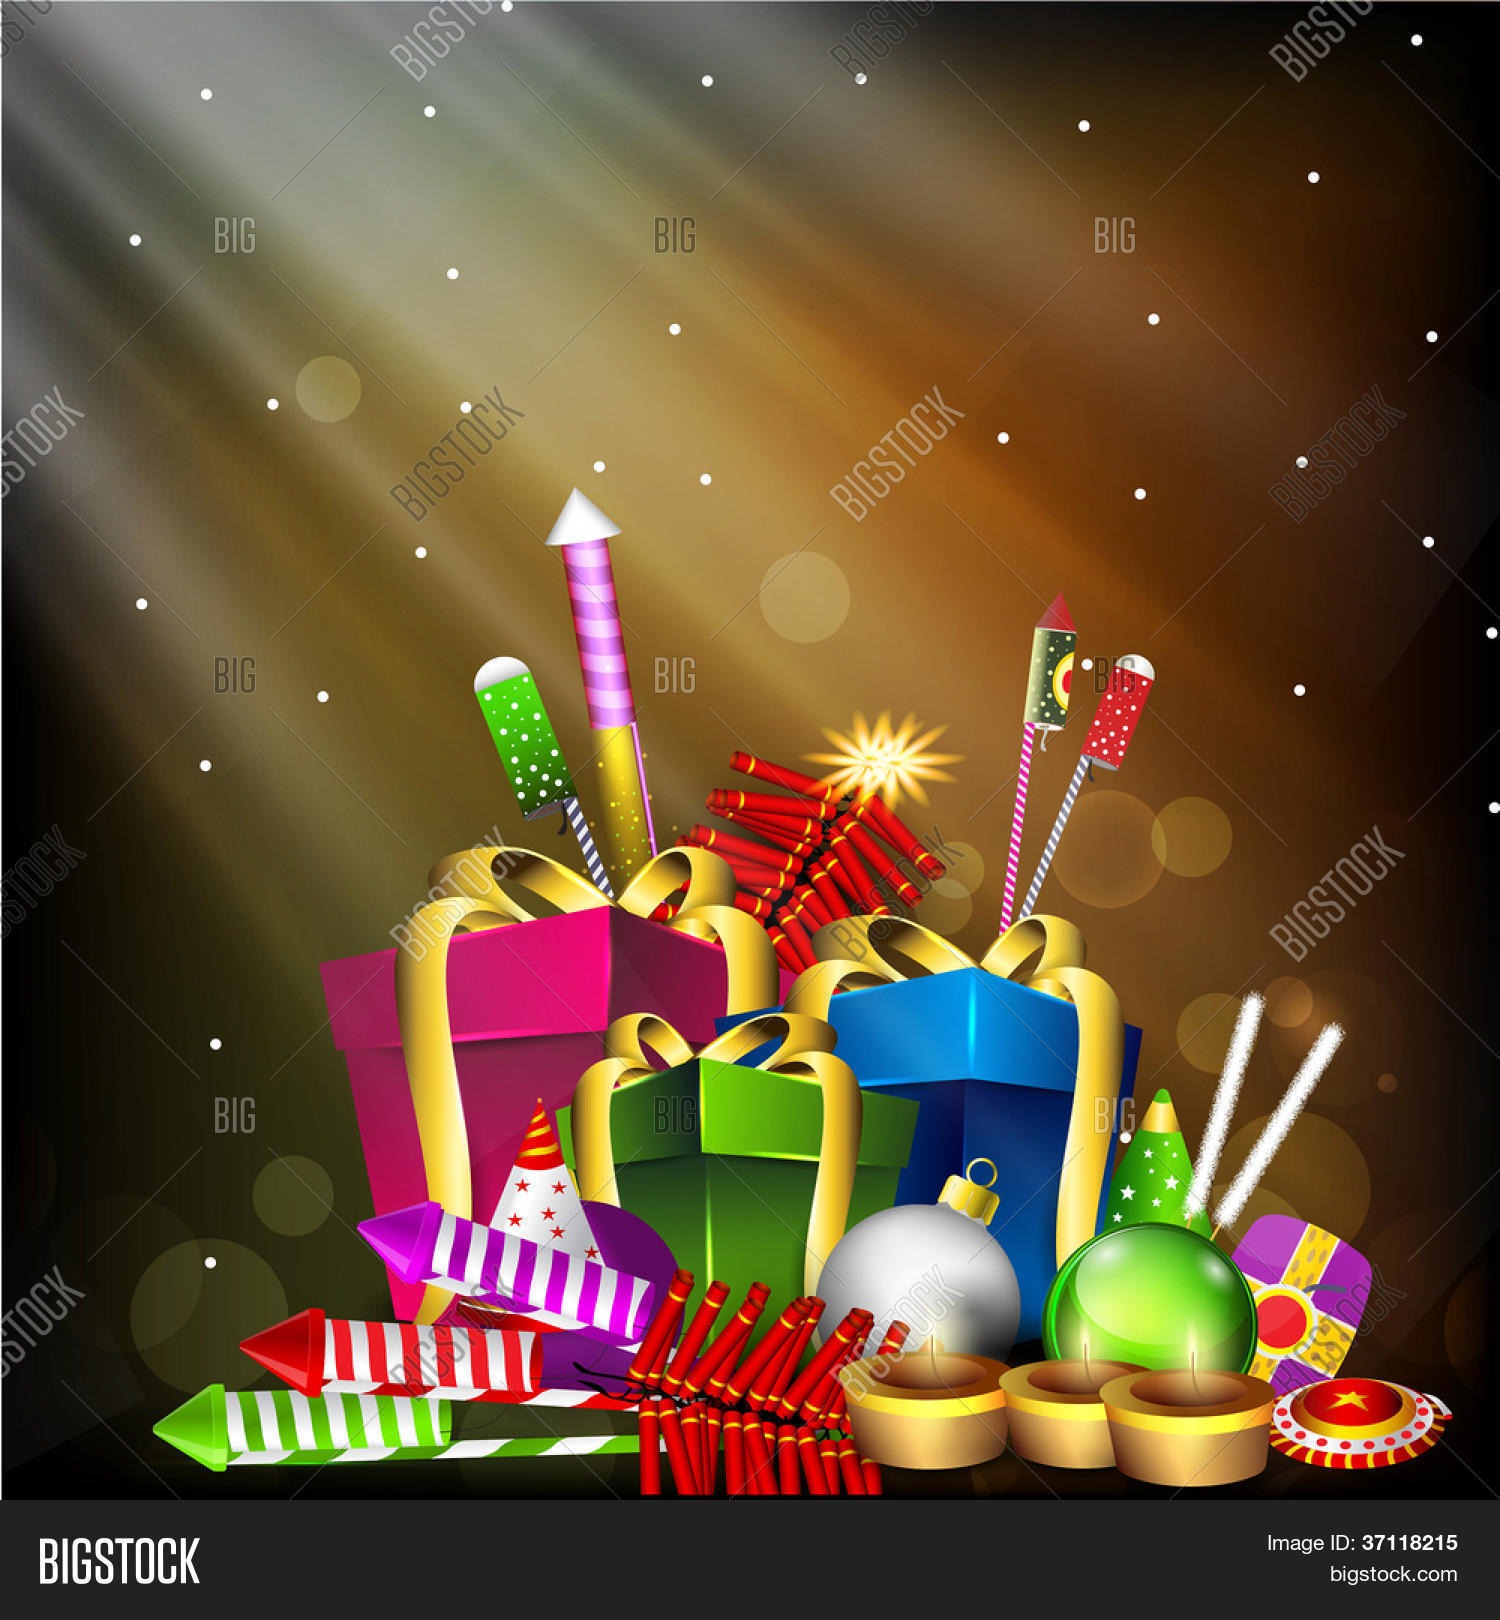 Greeting Card Diwali Vector Photo Free Trial Bigstock